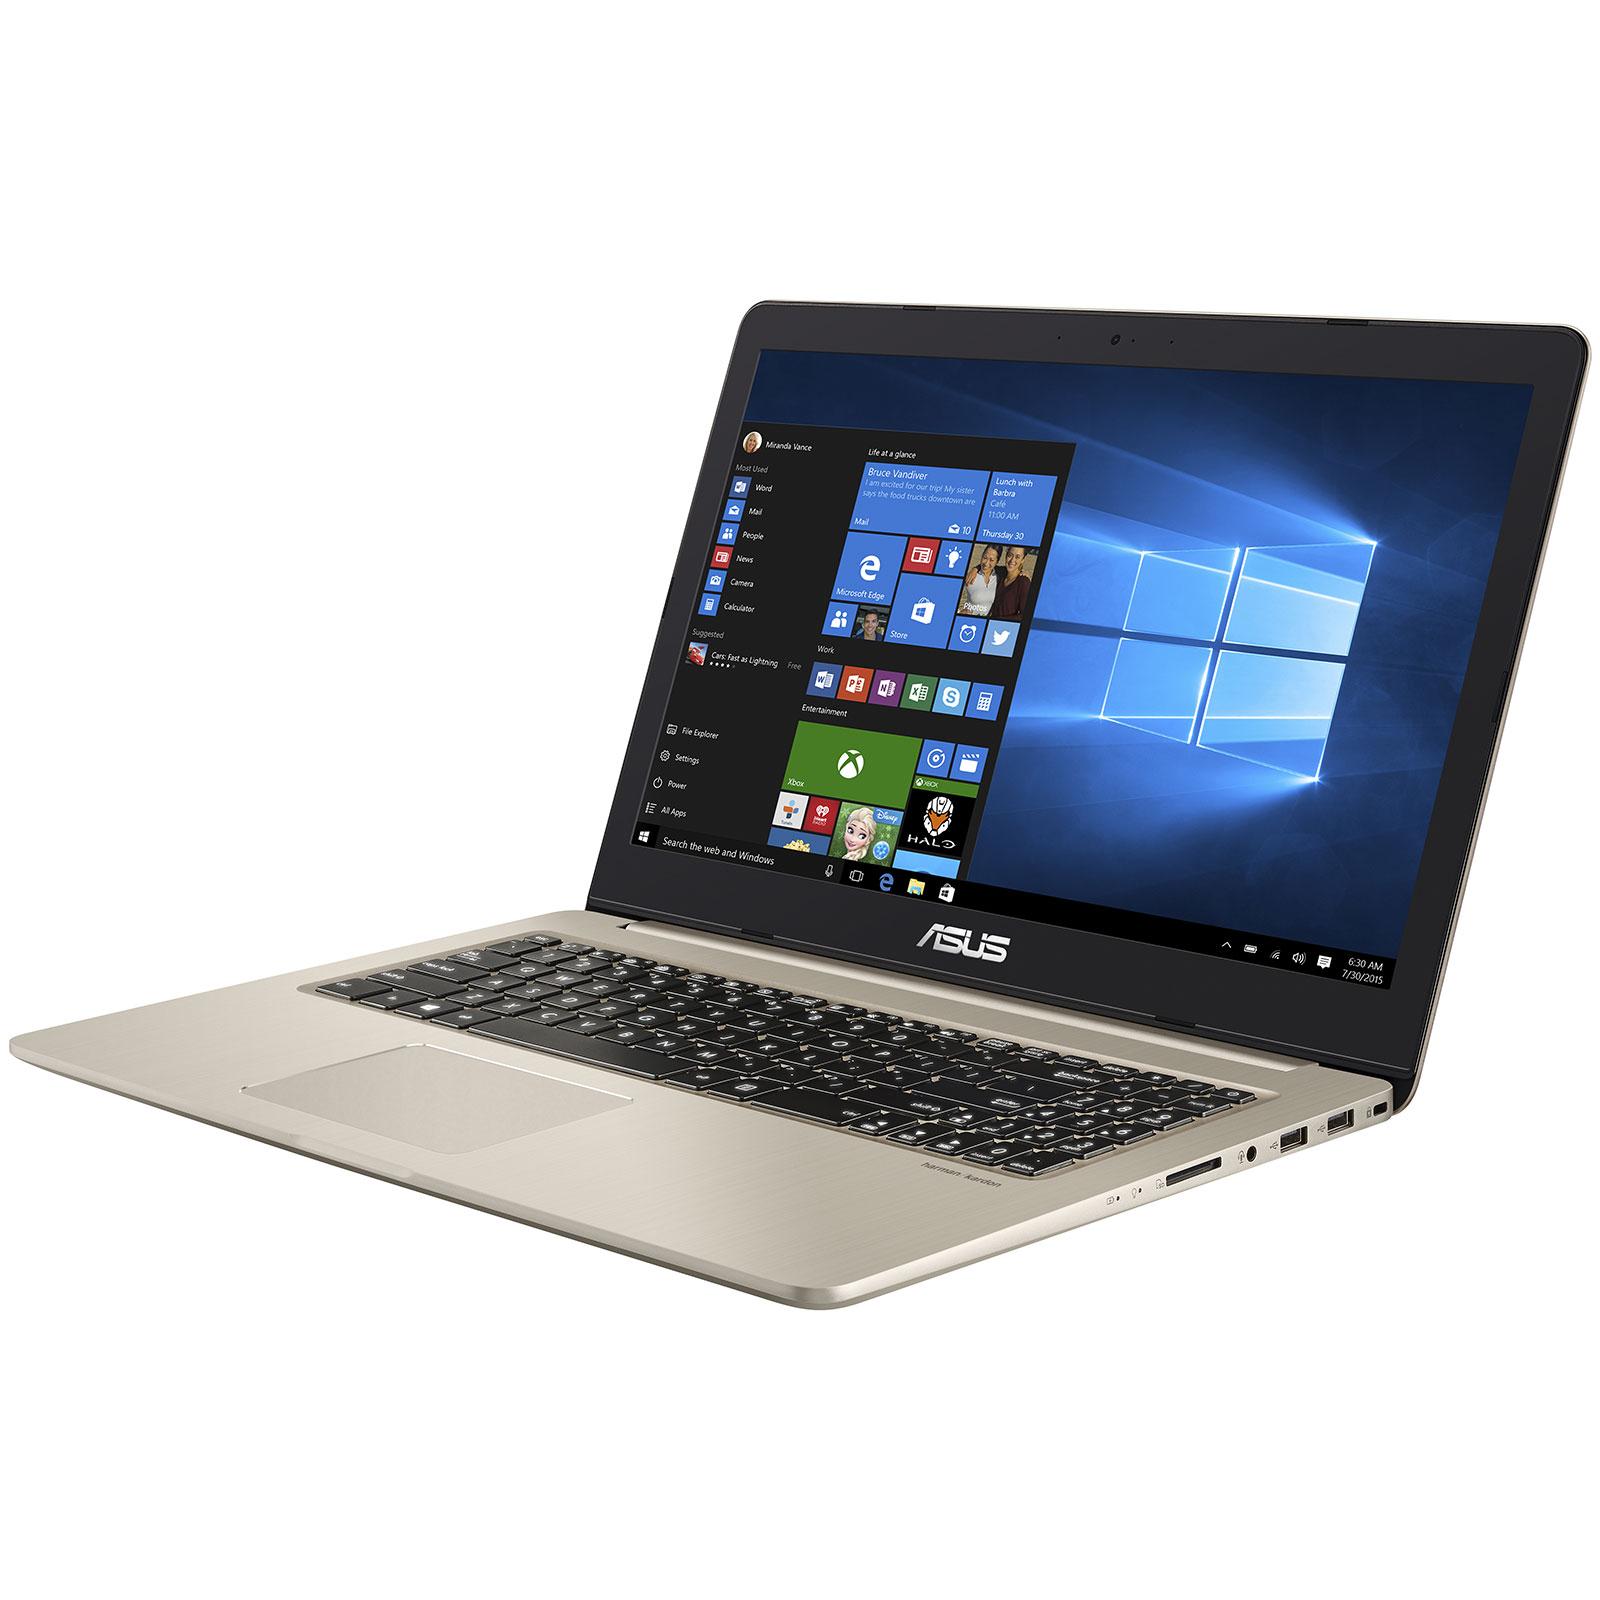 Asus NX580VD-FI523R - PC portable Asus - Cybertek.fr - 4